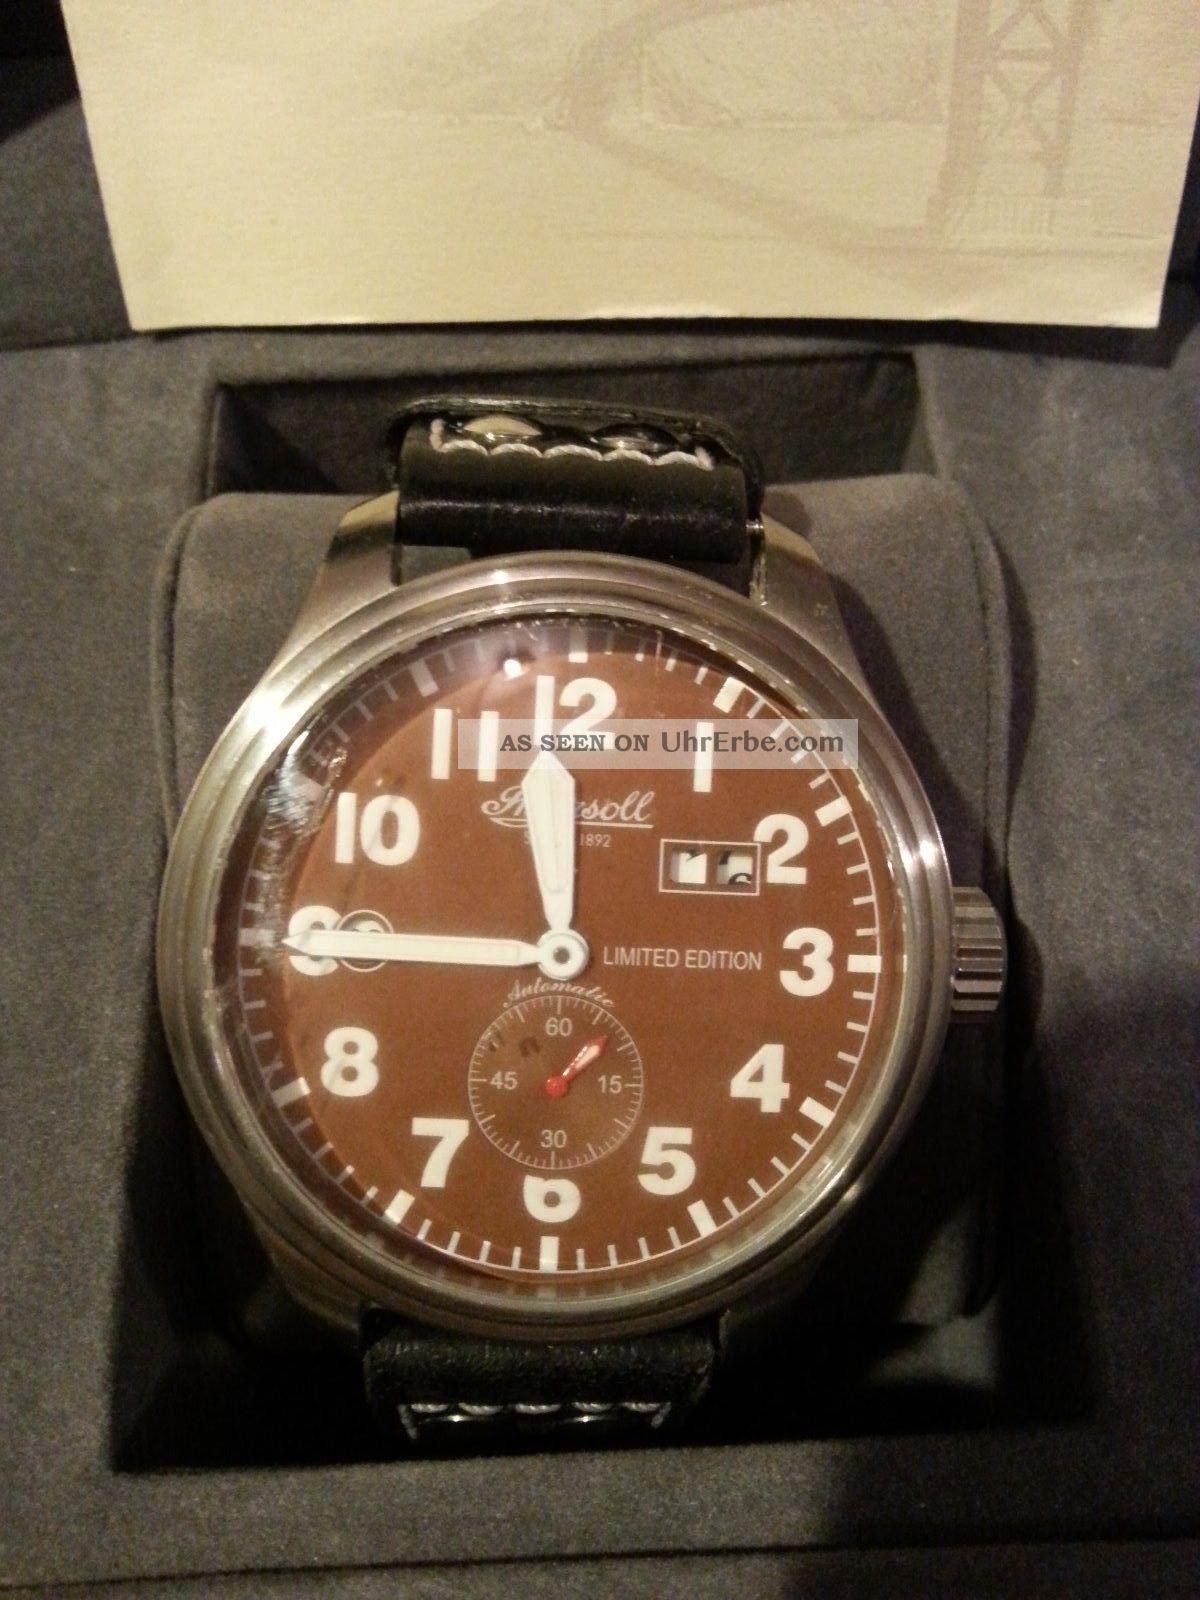 Ingersoll Gmt Herren Automatik Uhr Limited Edition Armbanduhren Bild